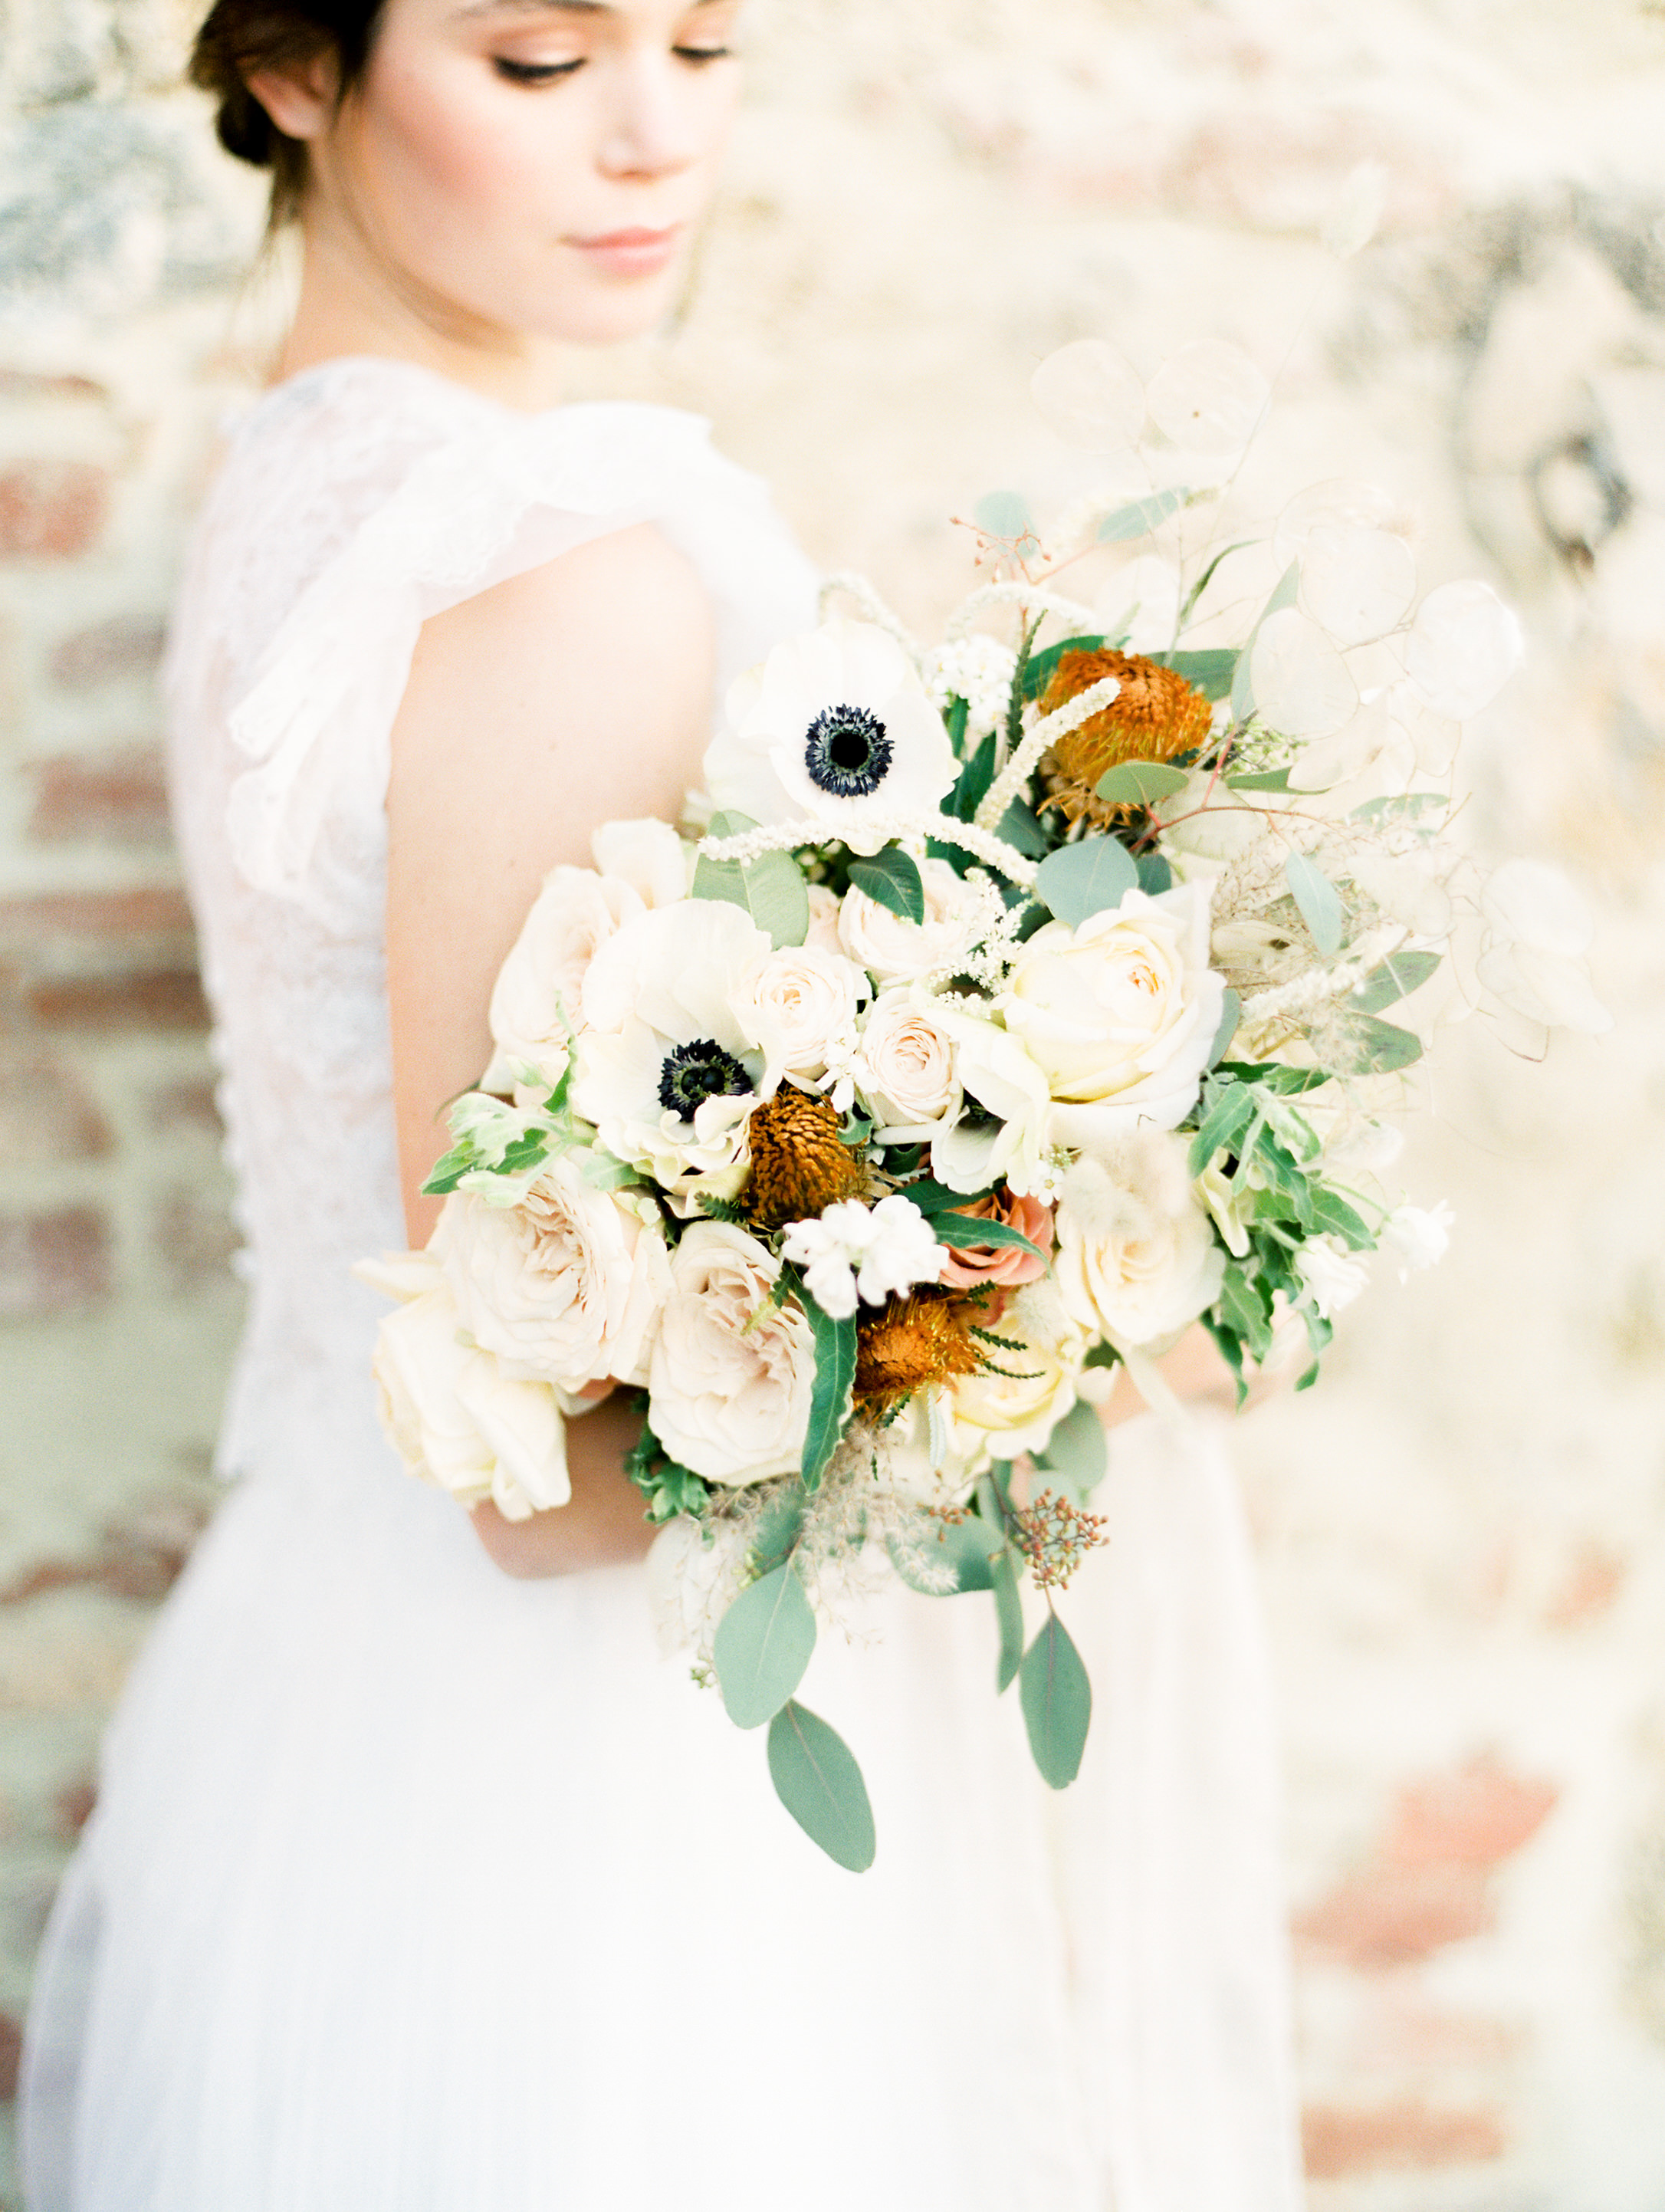 romantic-italy-wedding-in-tuscany-27.jpg